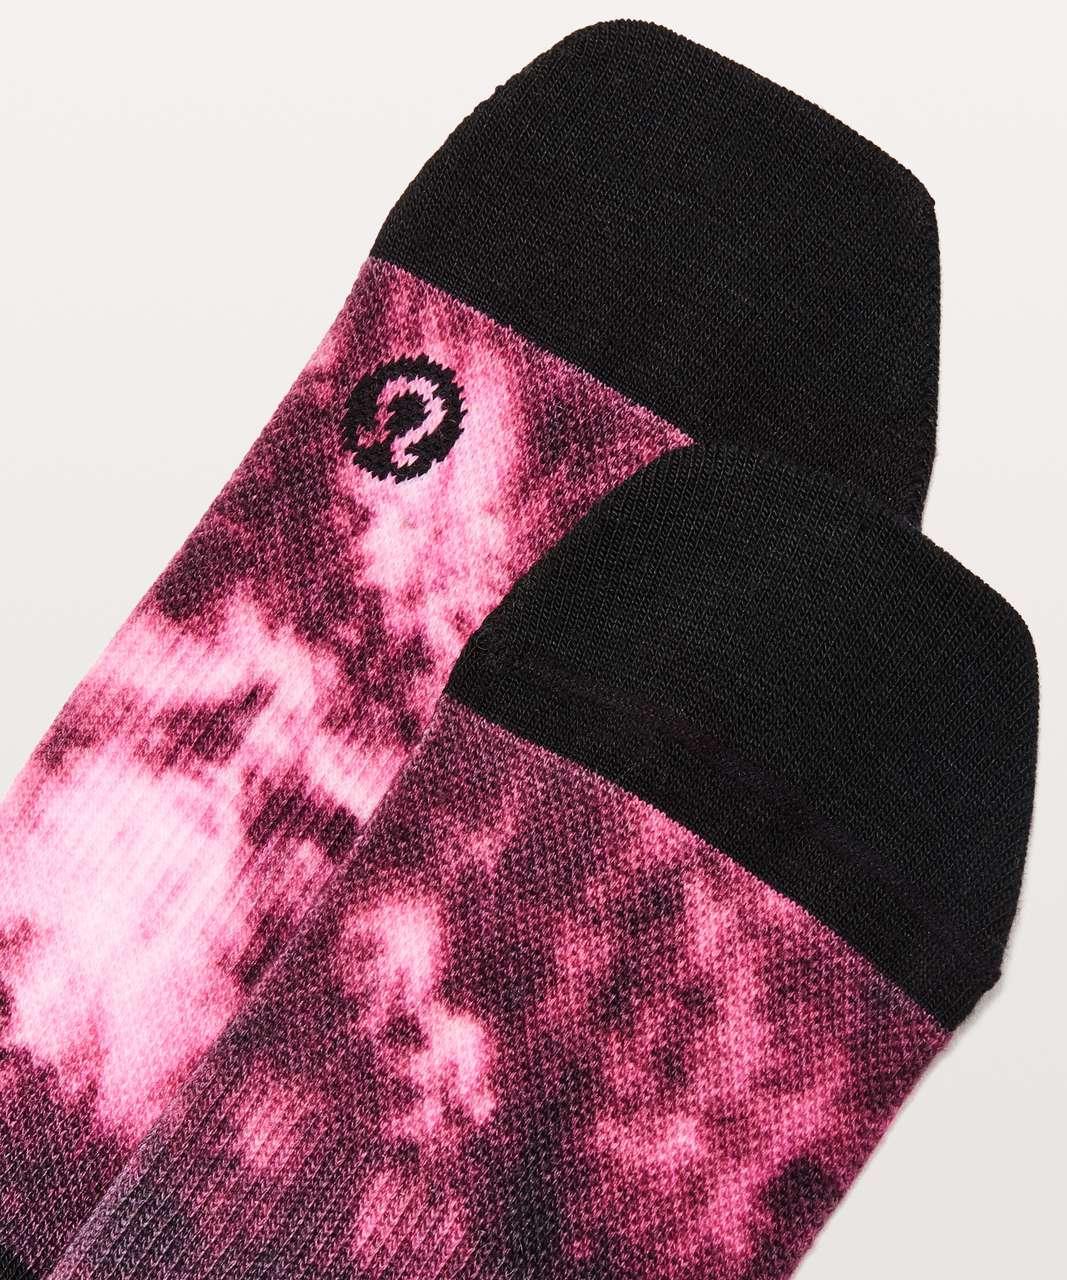 Lululemon True Crew Sock - Tye Dye Pink / Black